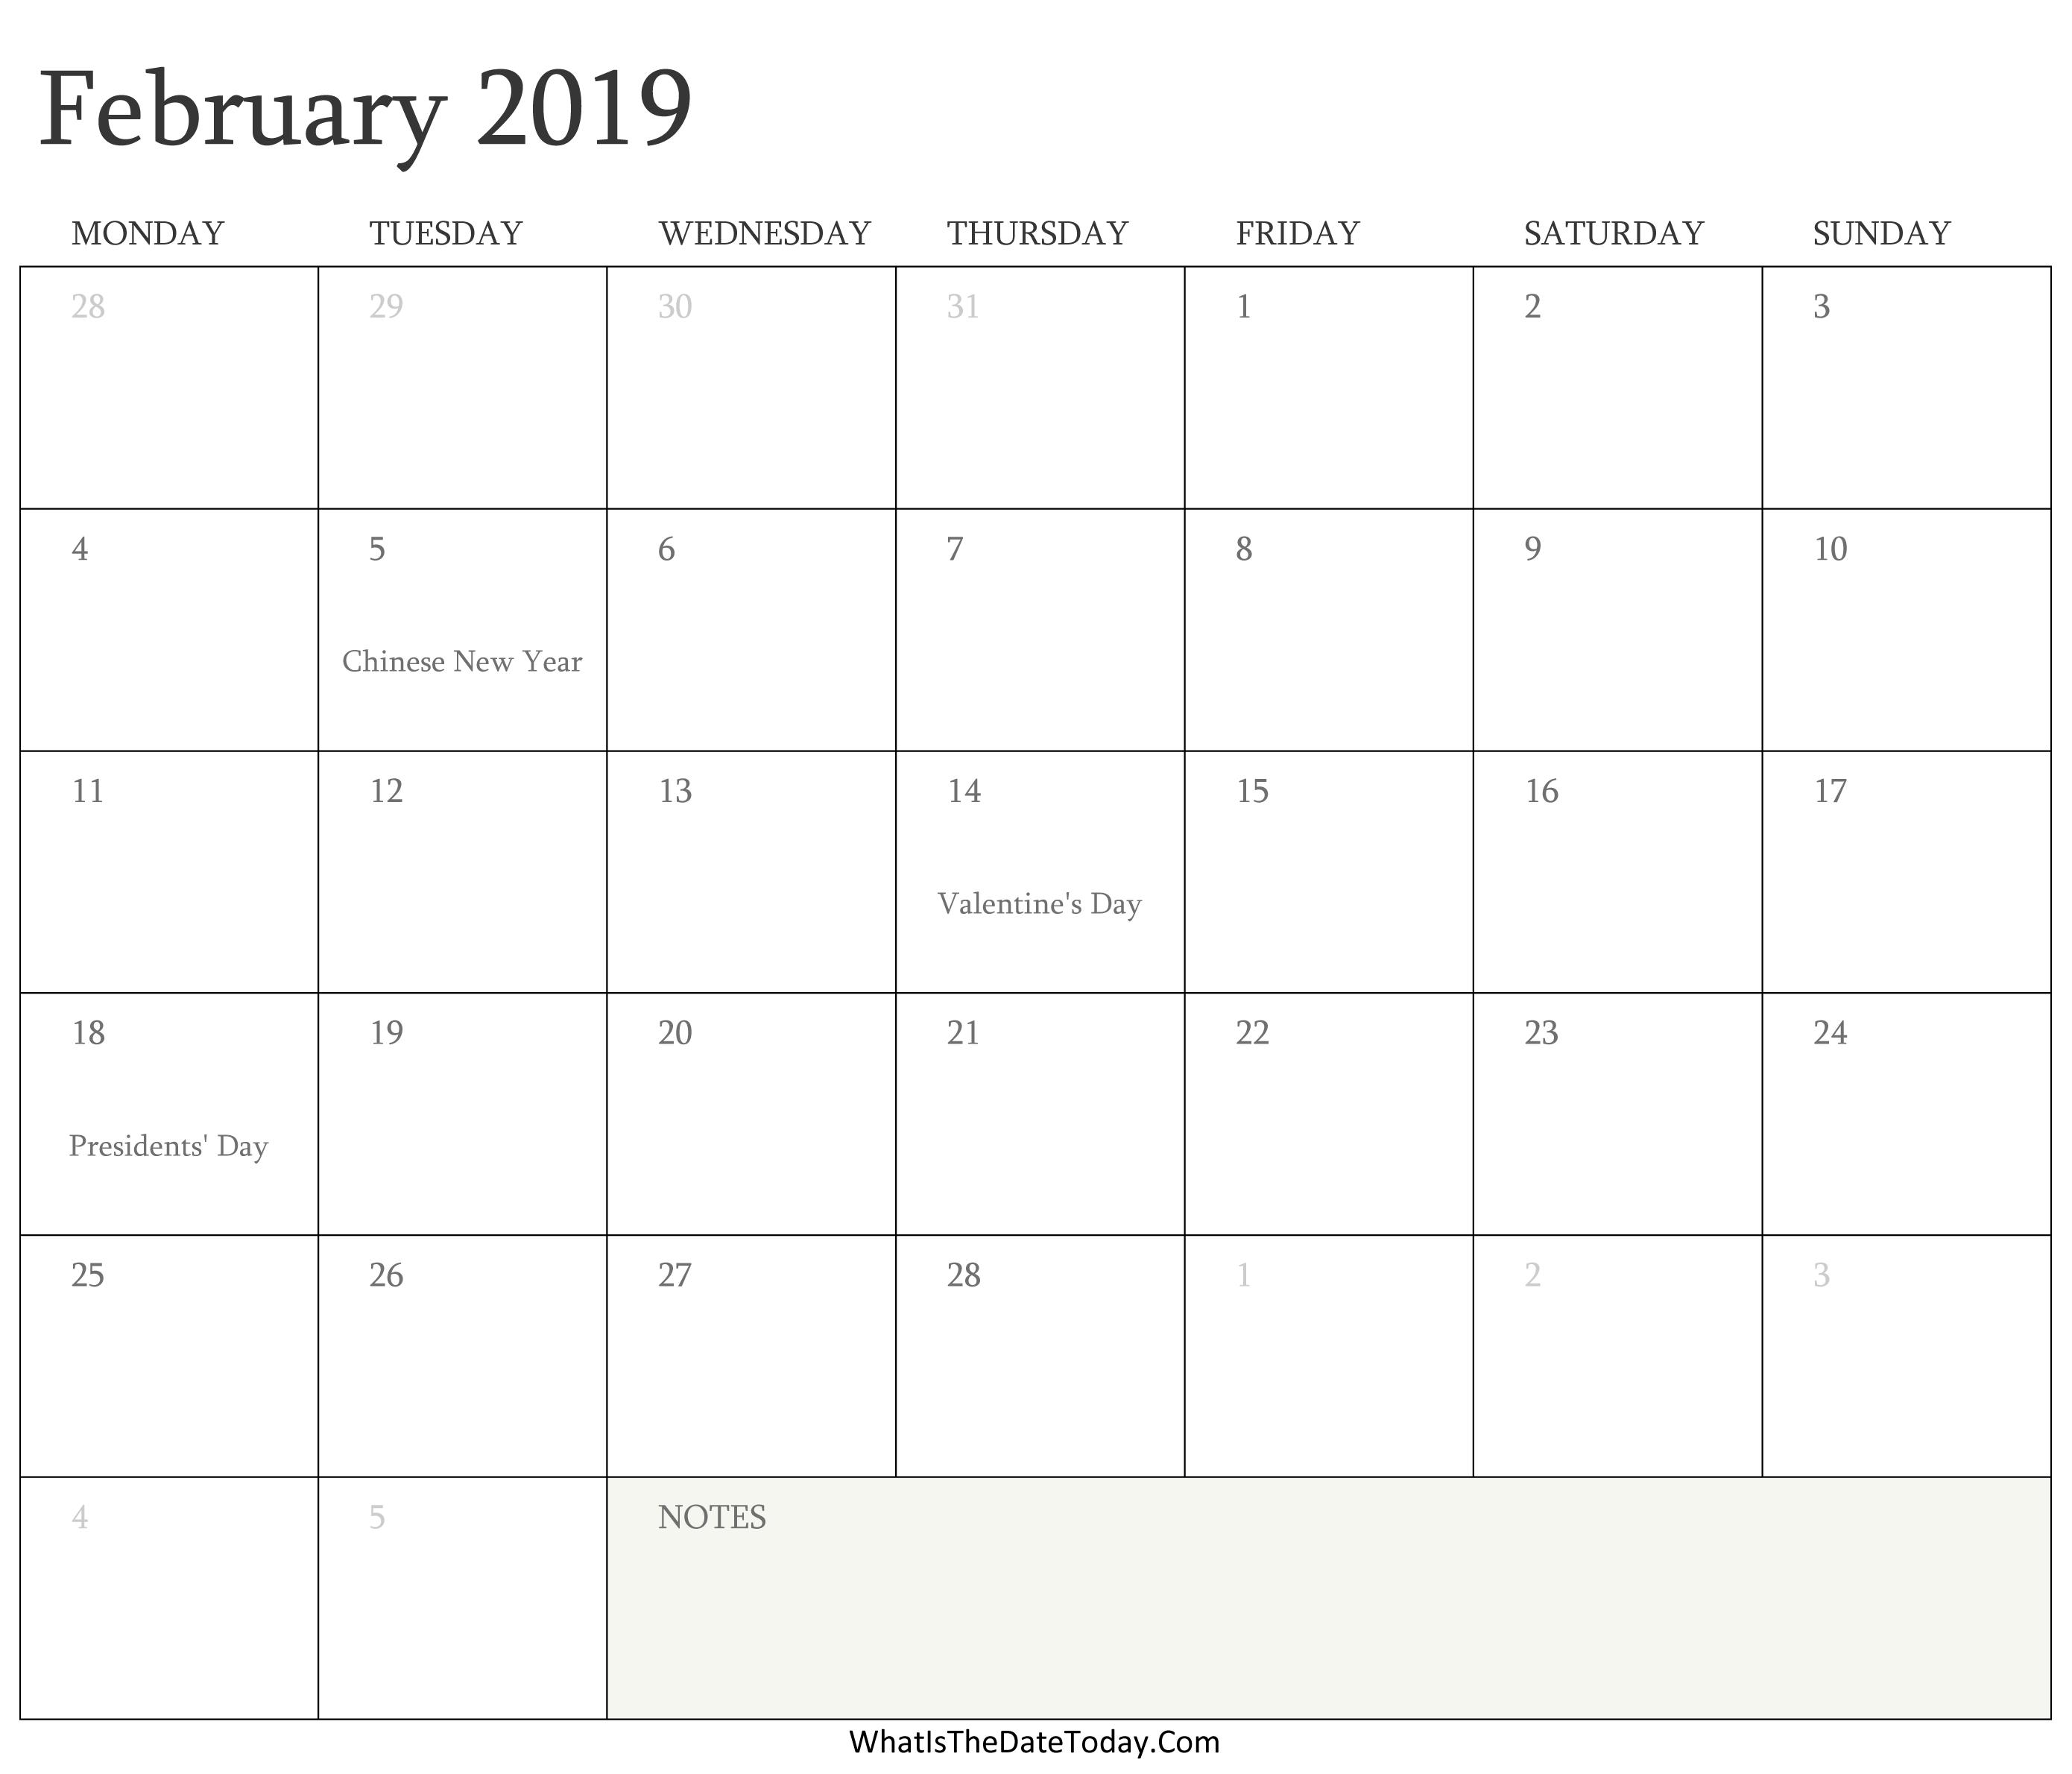 Feb 2019 Holiday Calendar